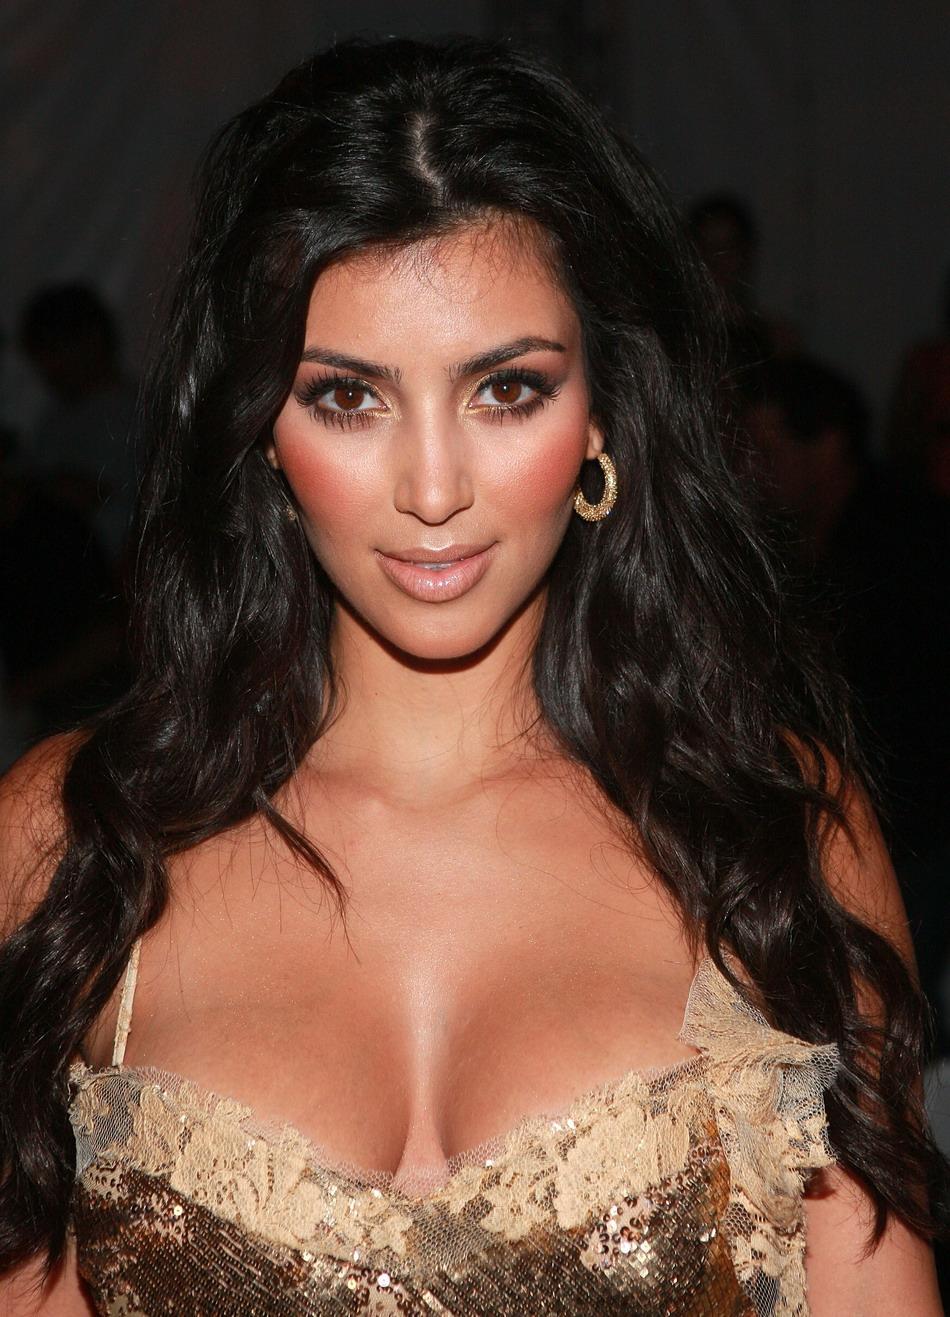 Ultra Cool Fun Stunning Photos Of Kim Kardashian